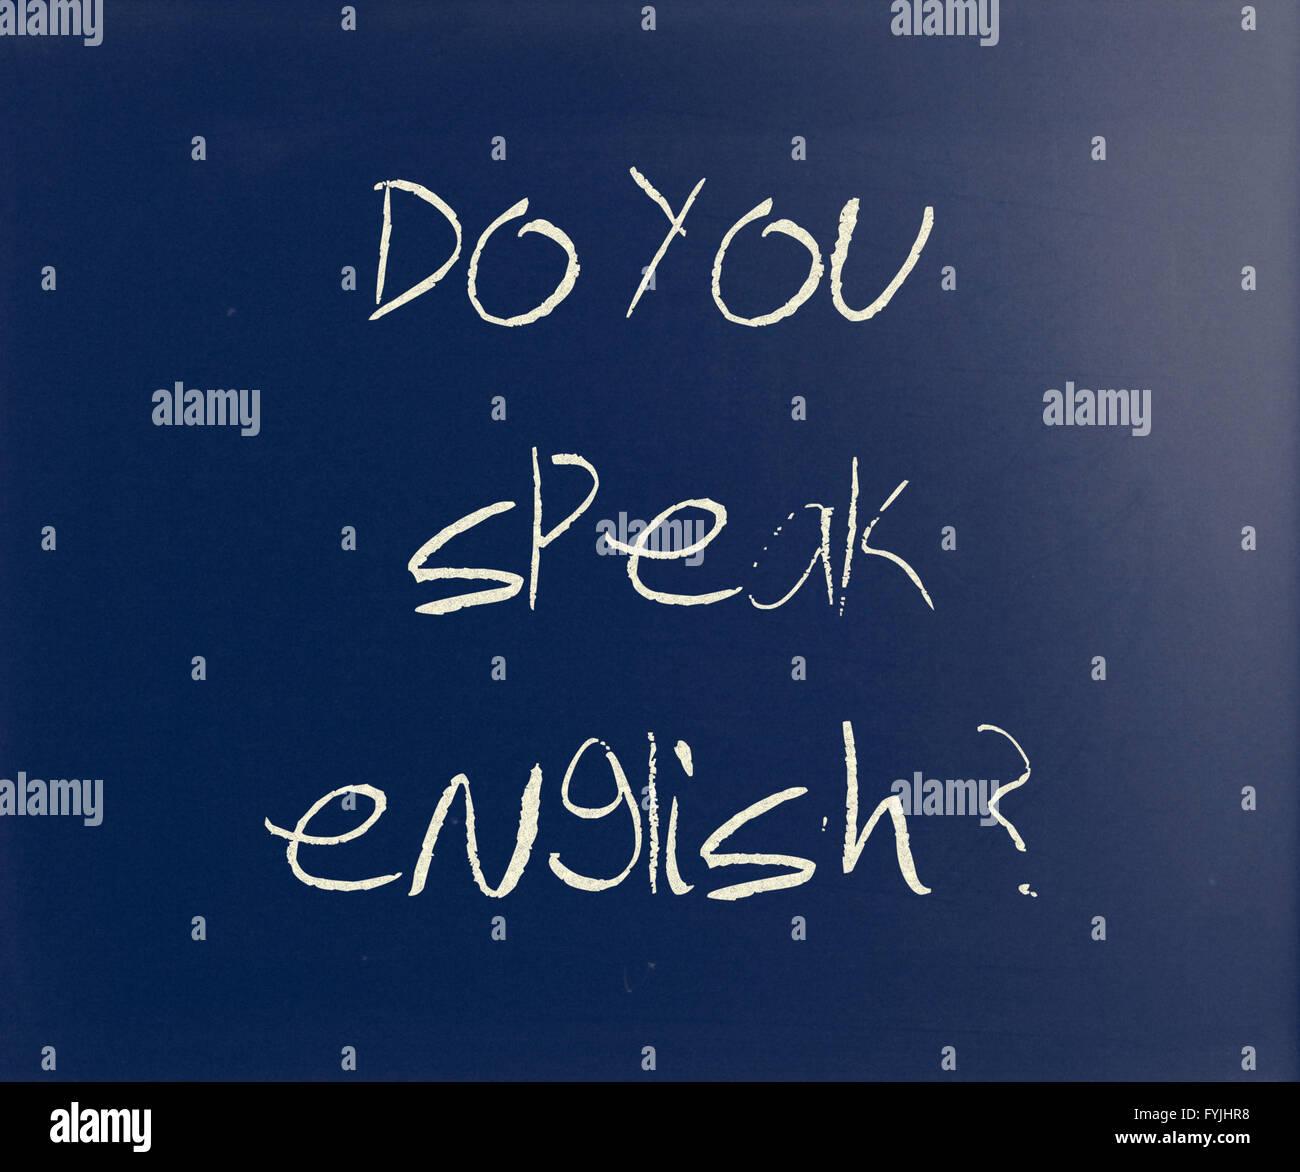 Do you speak english handwritten with white chalk on a blackboard - Stock Image